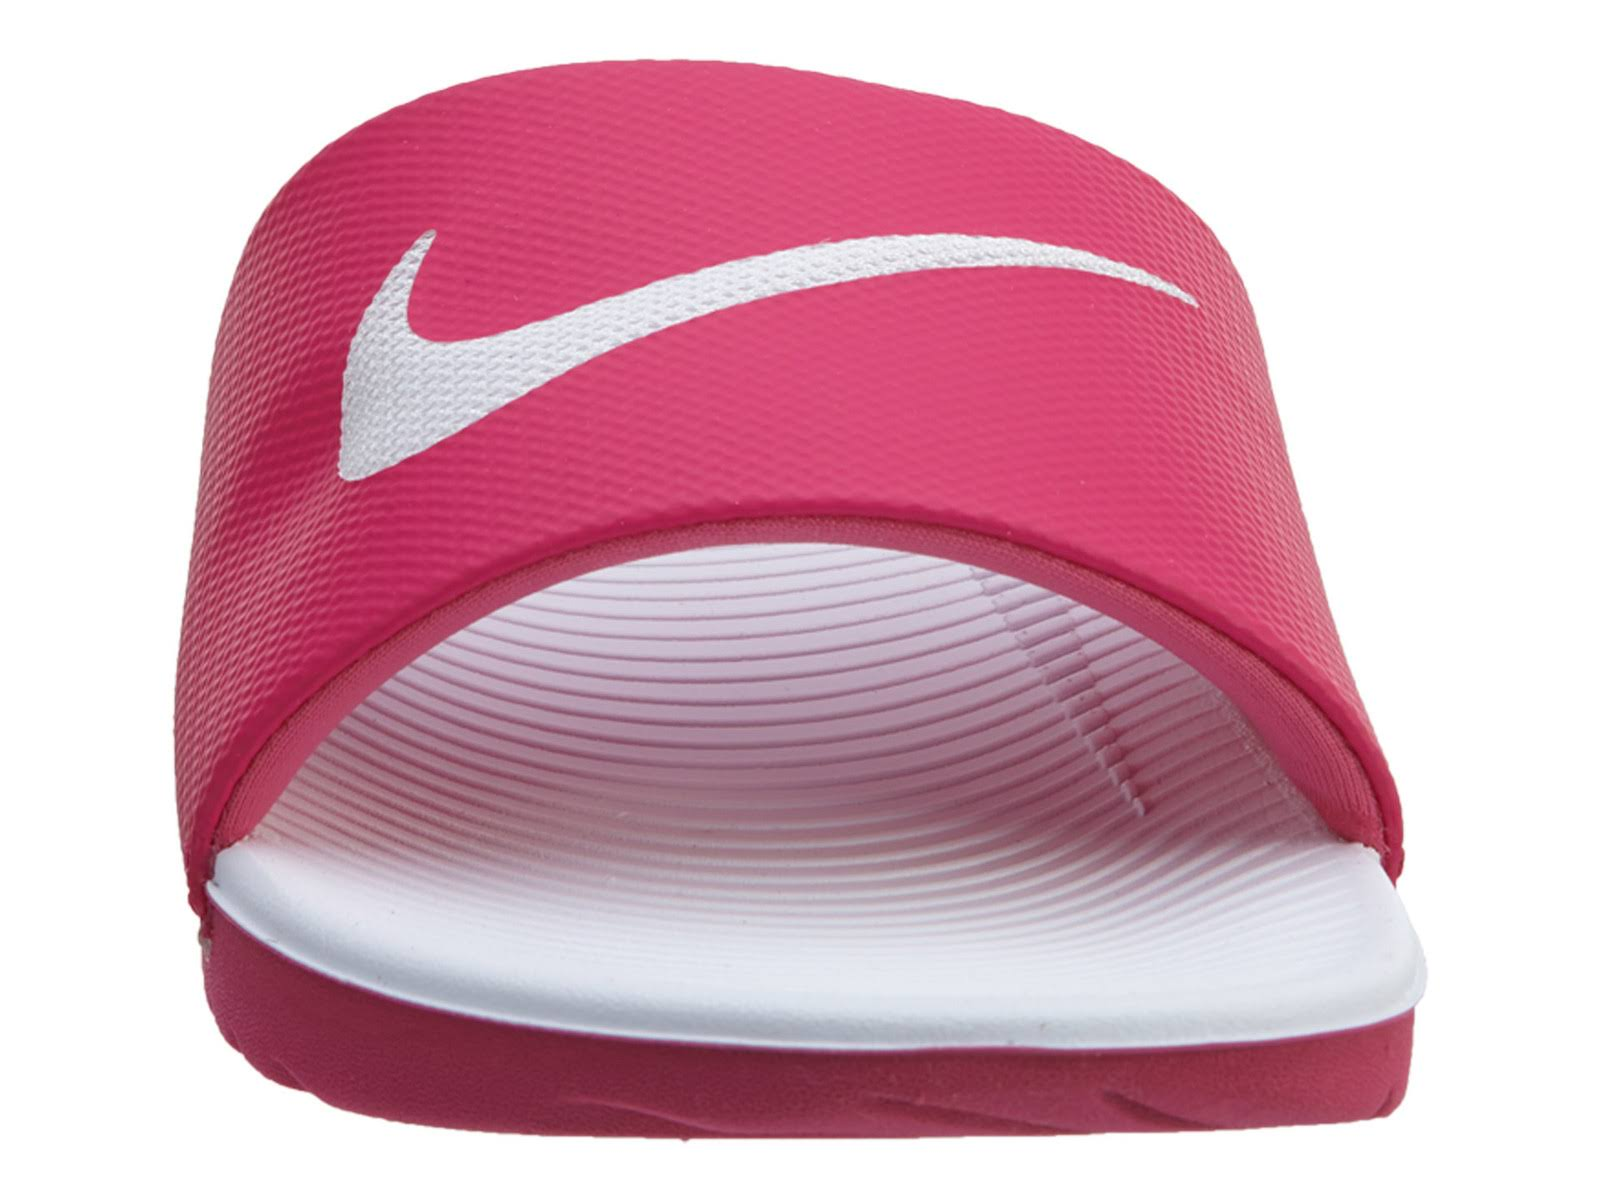 Kids Big Nike Tamaño 819353 Style Slide Kawa 11 wfqnRqtzS